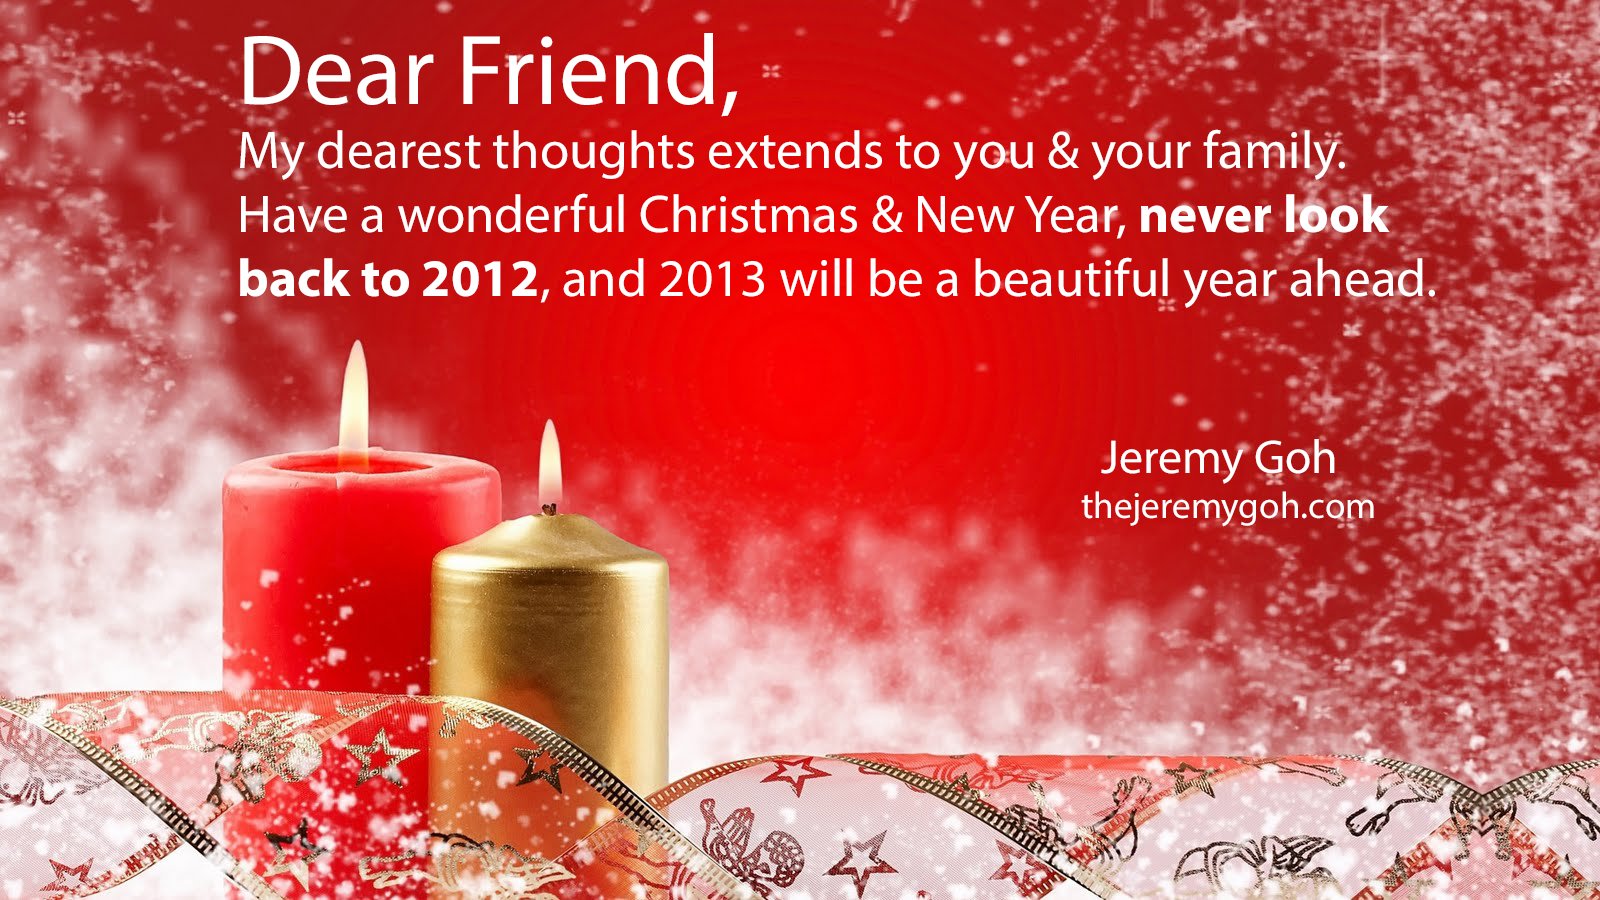 Christmas Wishes Samples Christmas Wishes Samples Christmas Wish – Christmas Wish Sample